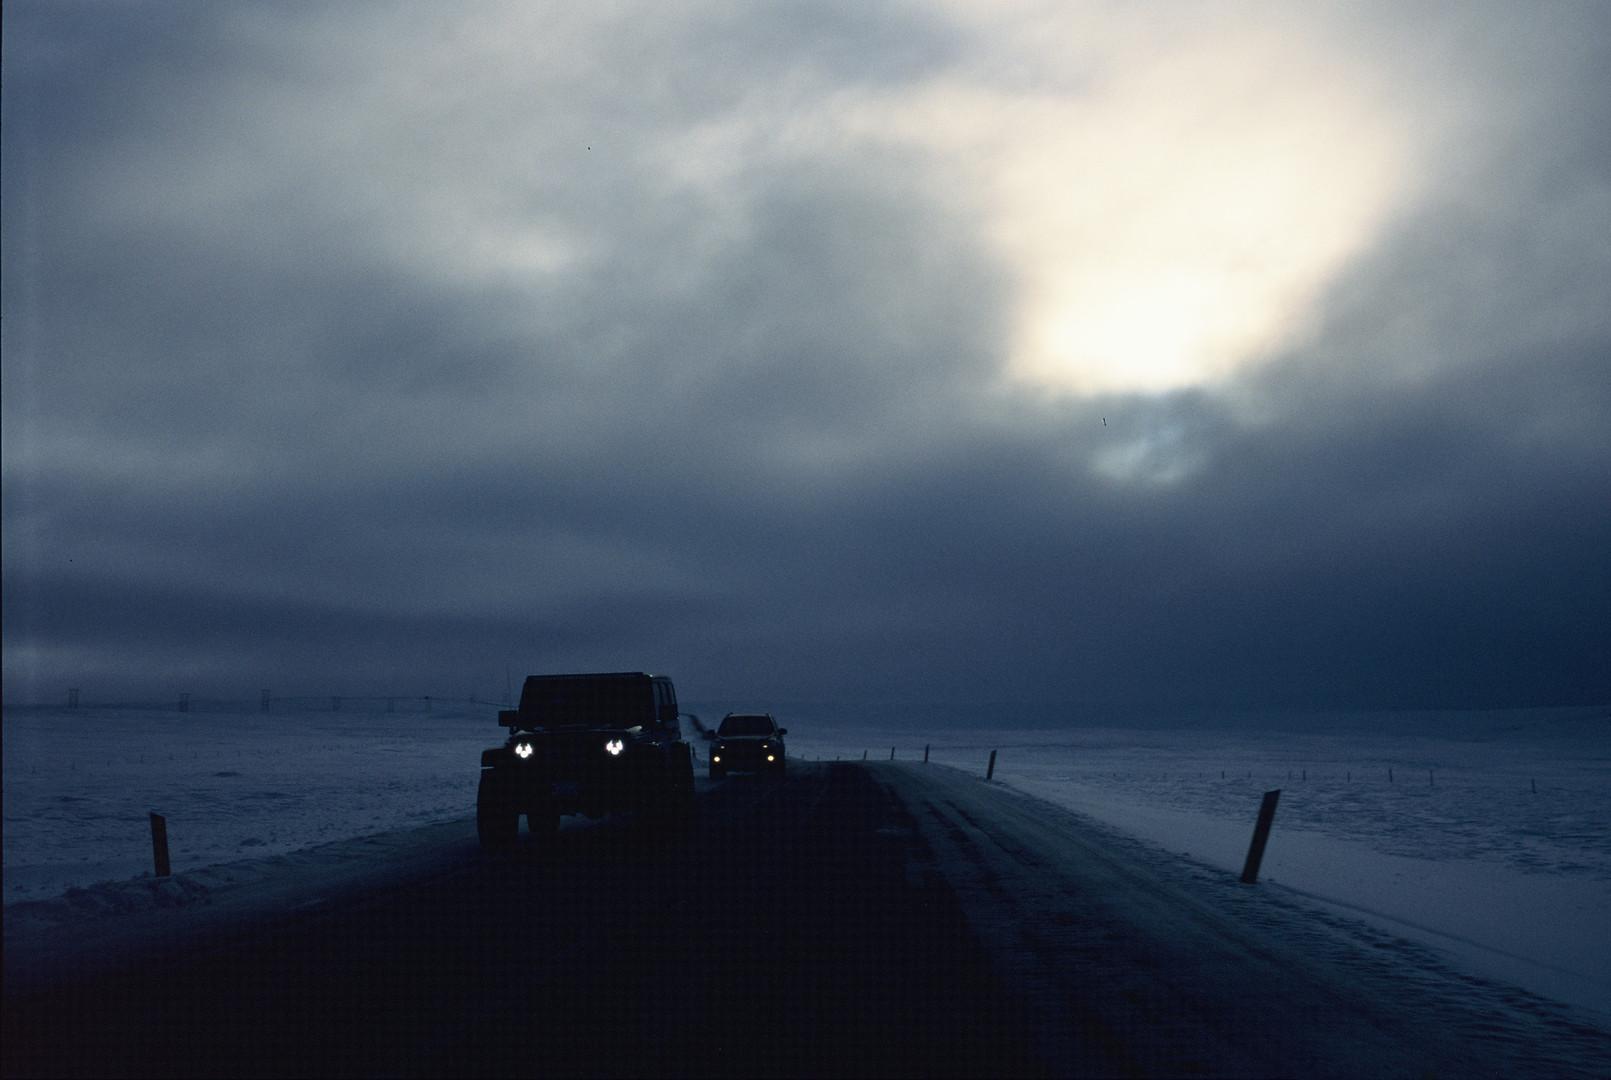 Iceland umferð